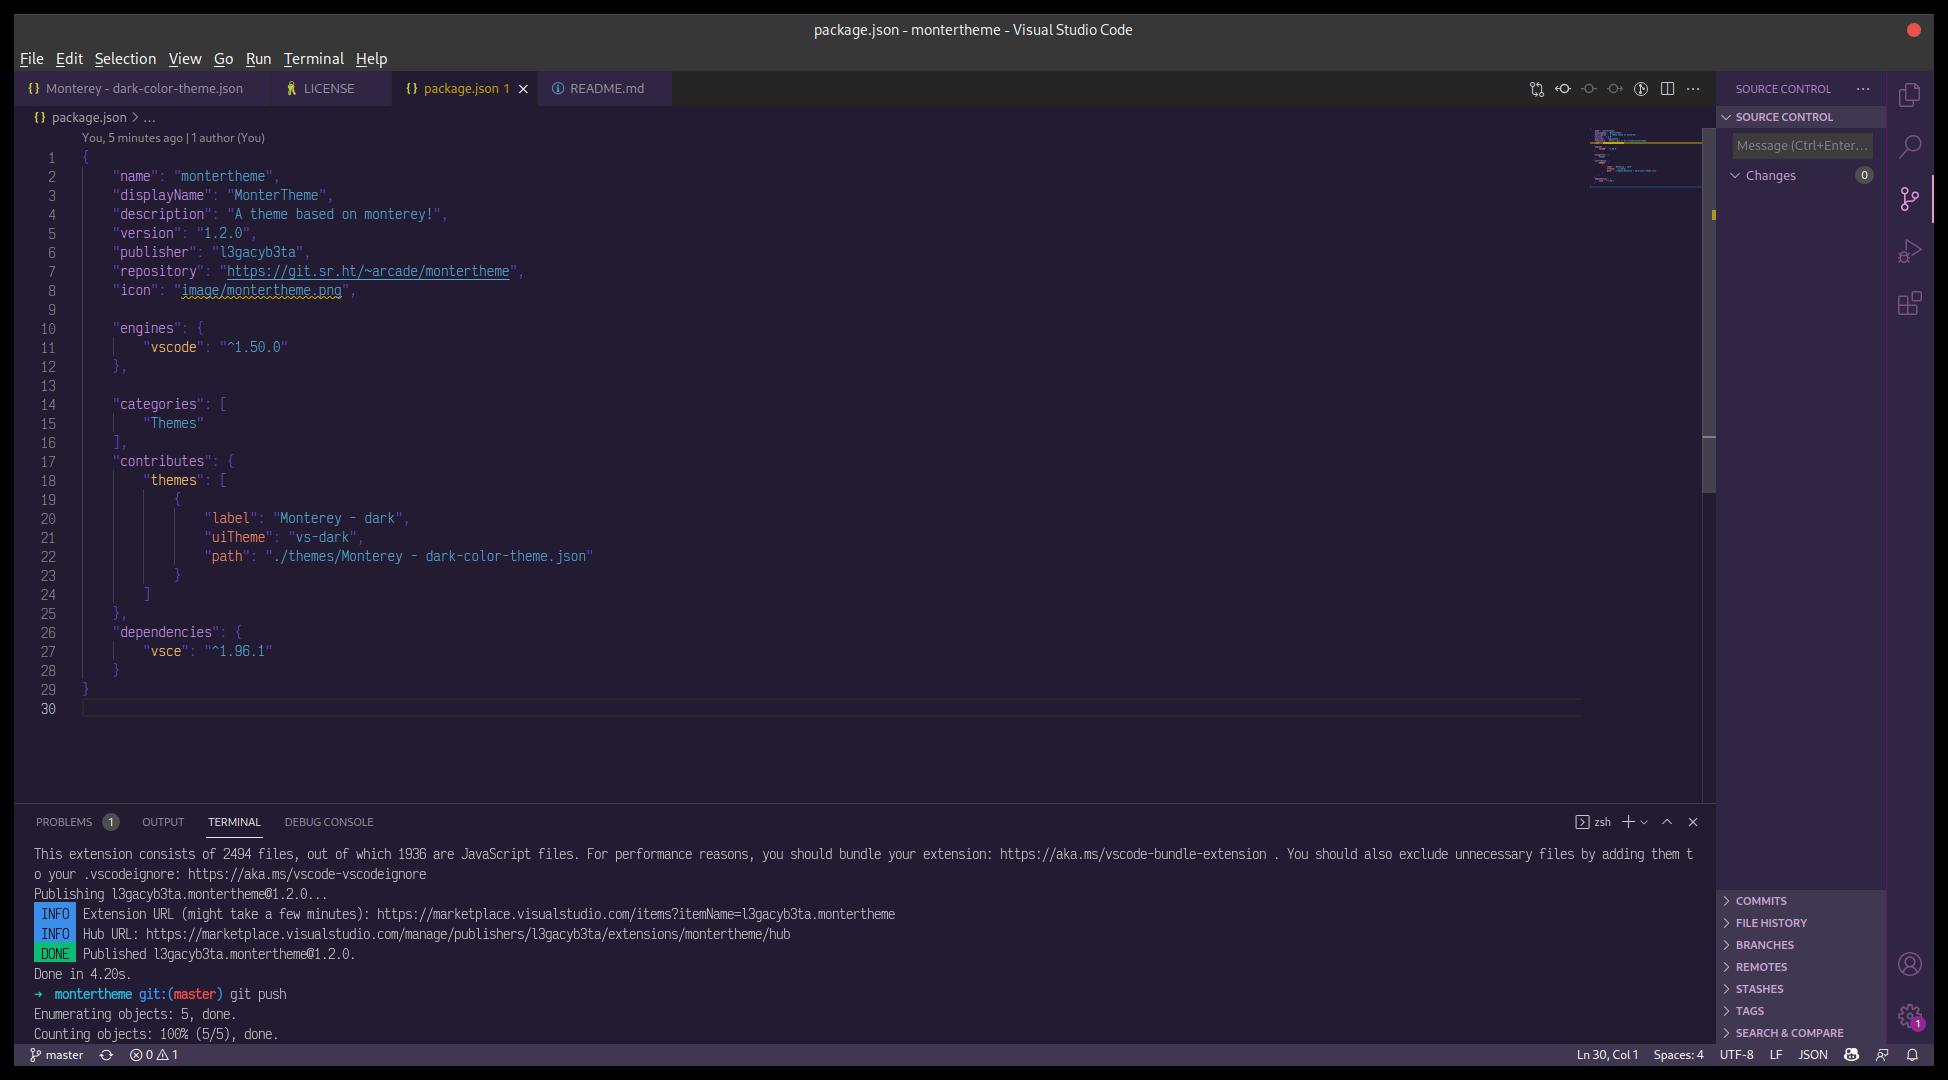 https://cloud-apv7ptxb9-hack-club-bot.vercel.app/0screenshot_from_2021-08-01_21-01-41.png